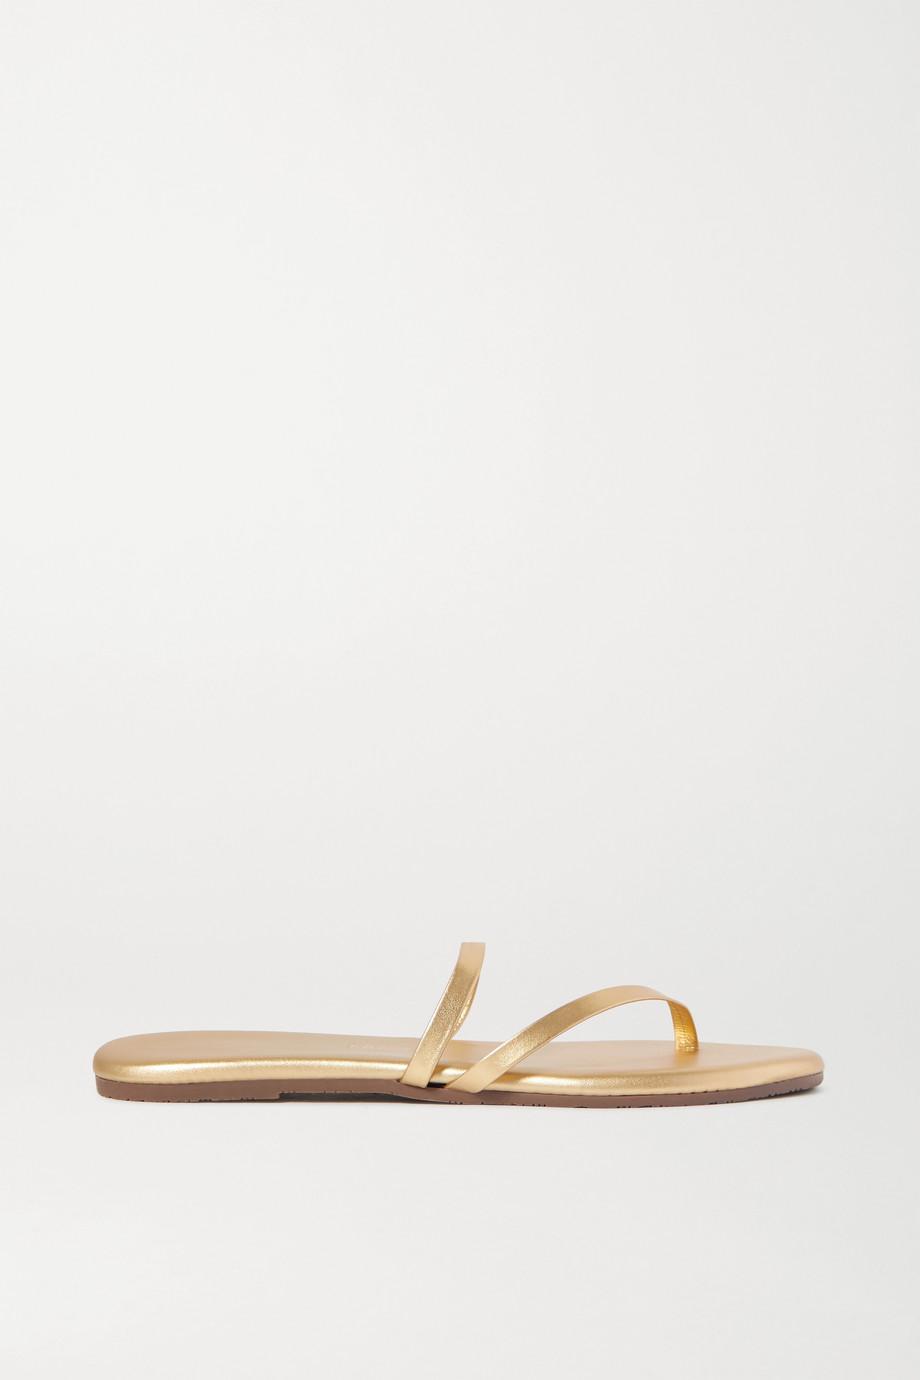 TKEES Sarit metallic leather sandals